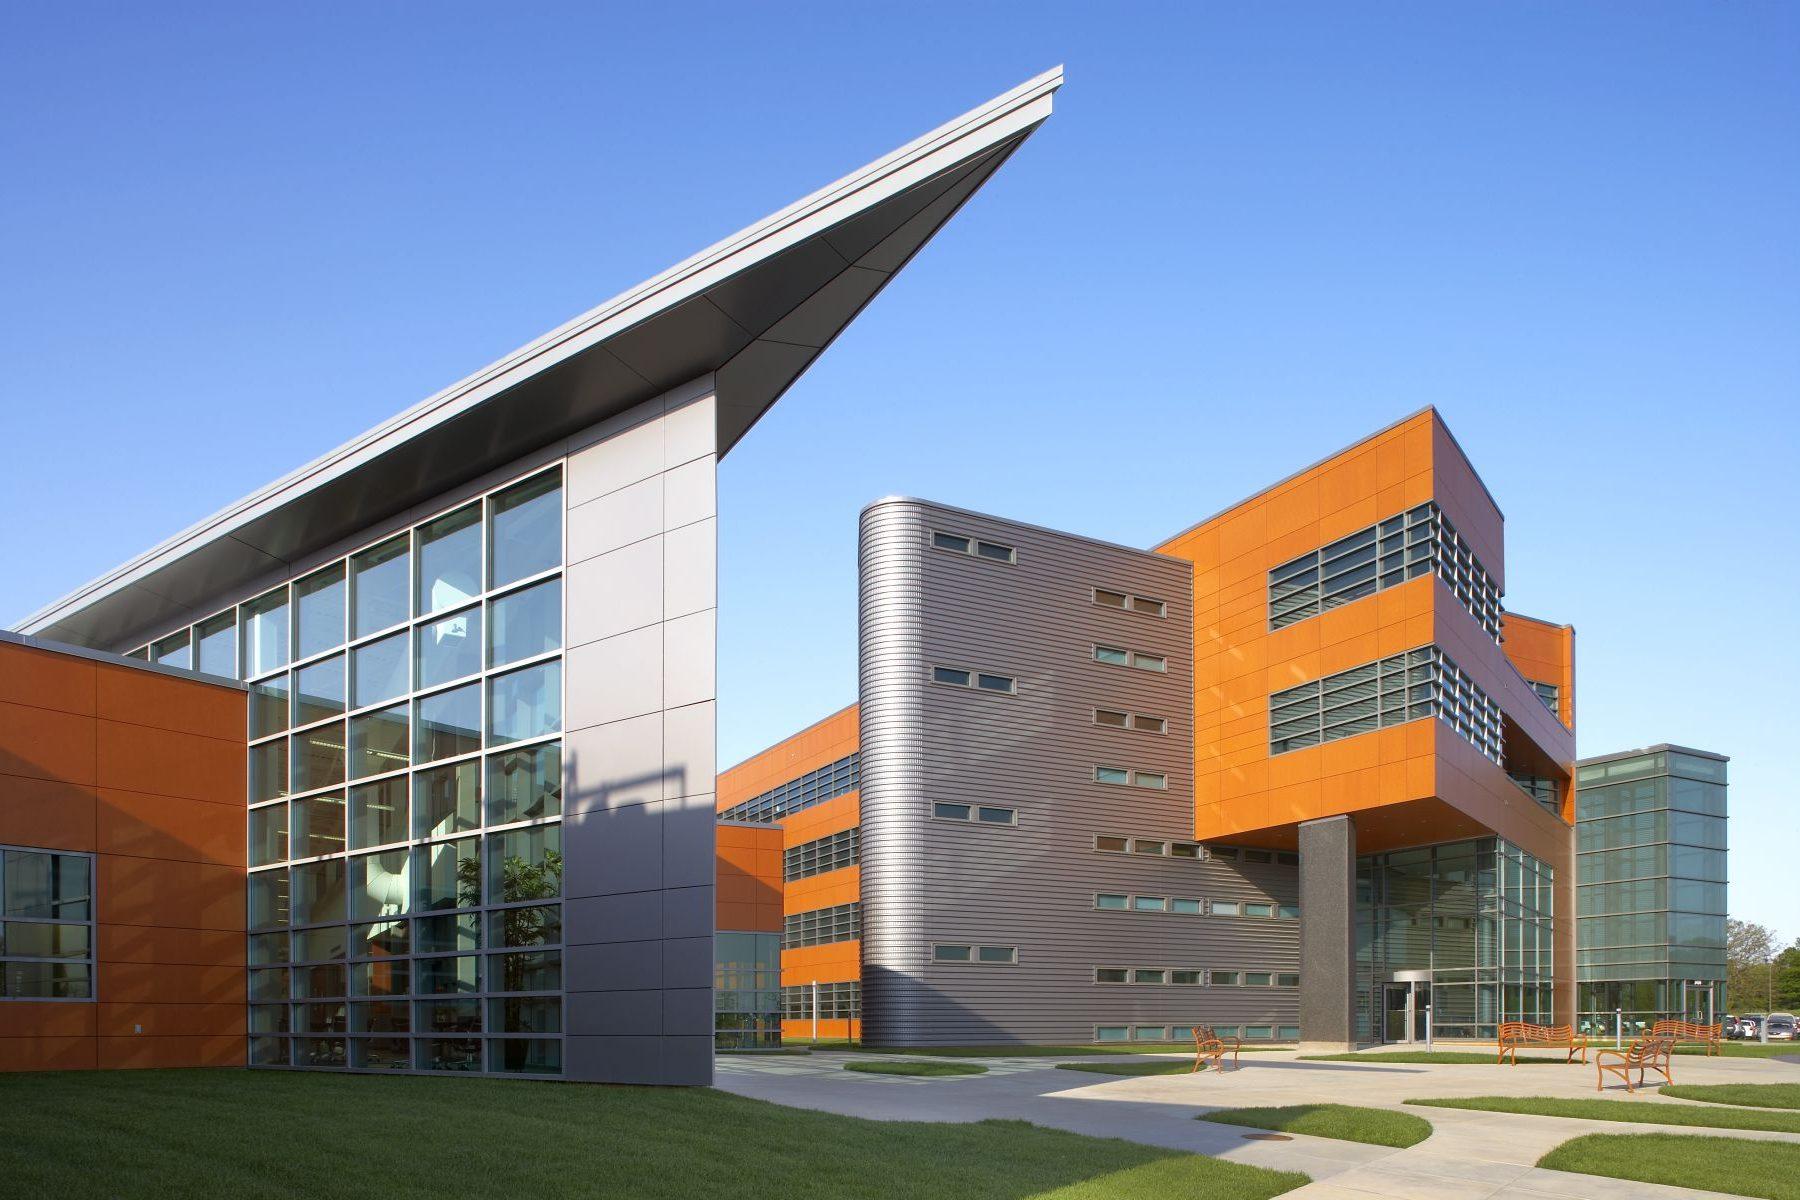 Tyson Discovery Center Exterior 2